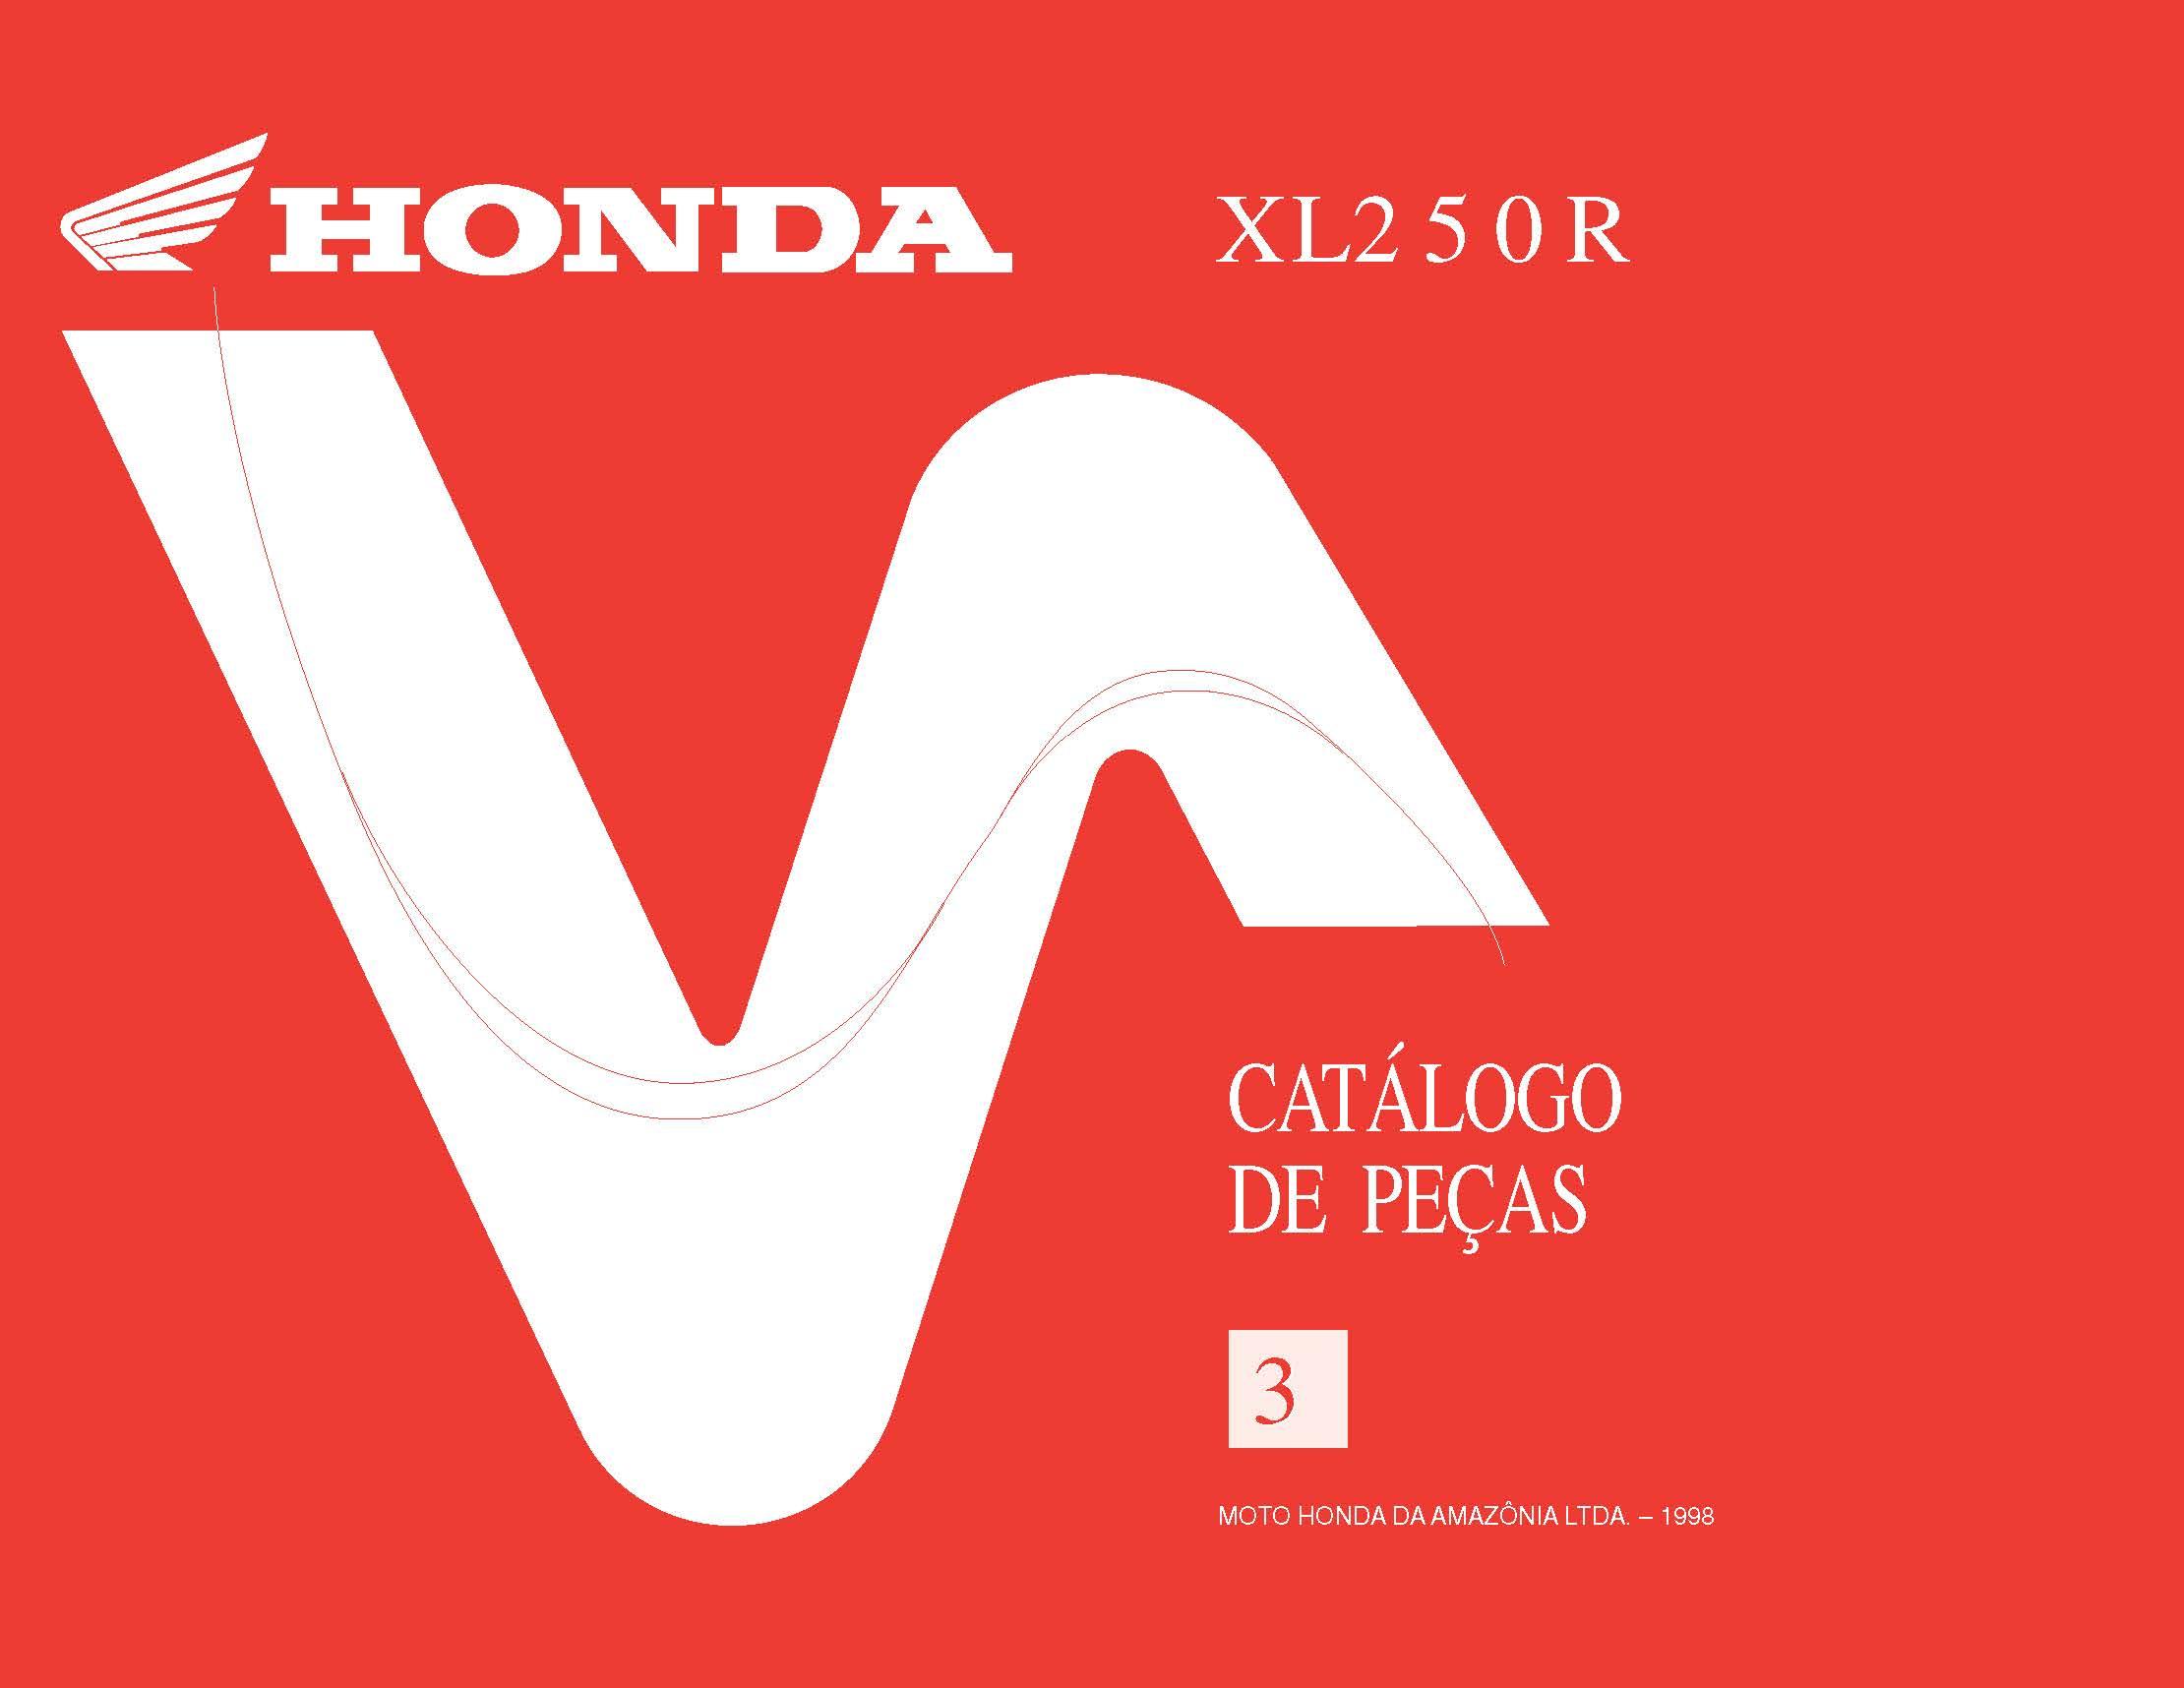 Parts List for Honda XL250R (1998) (Portugese)